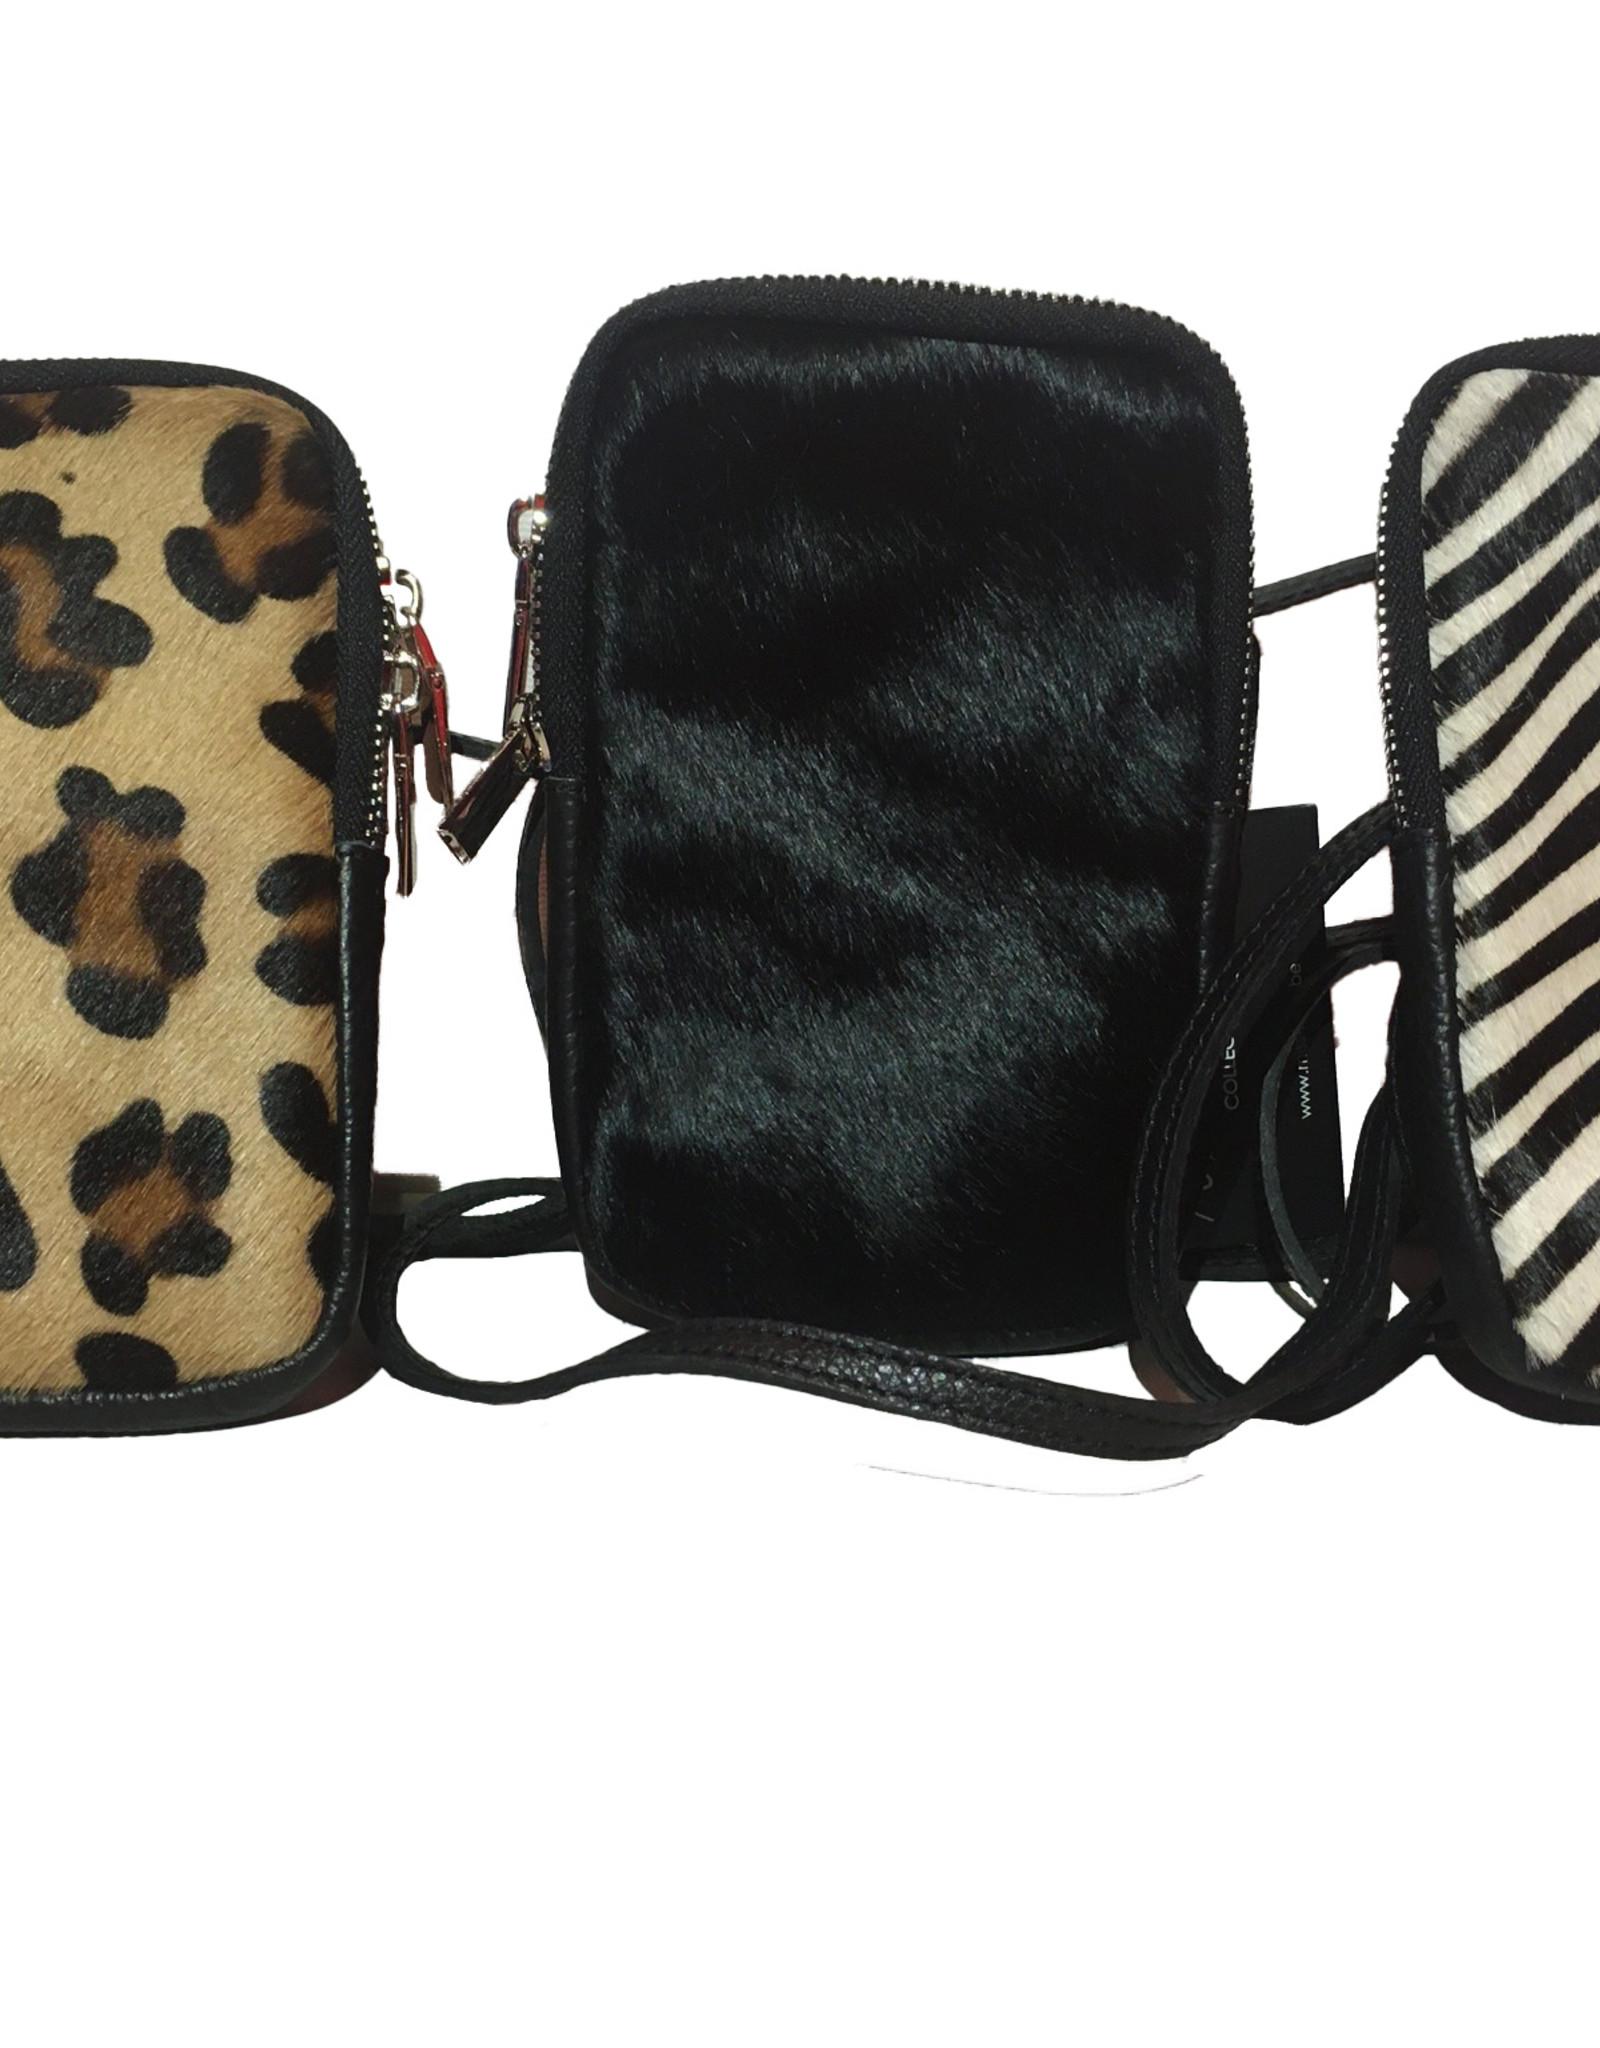 Mobile phone bag in cowskin